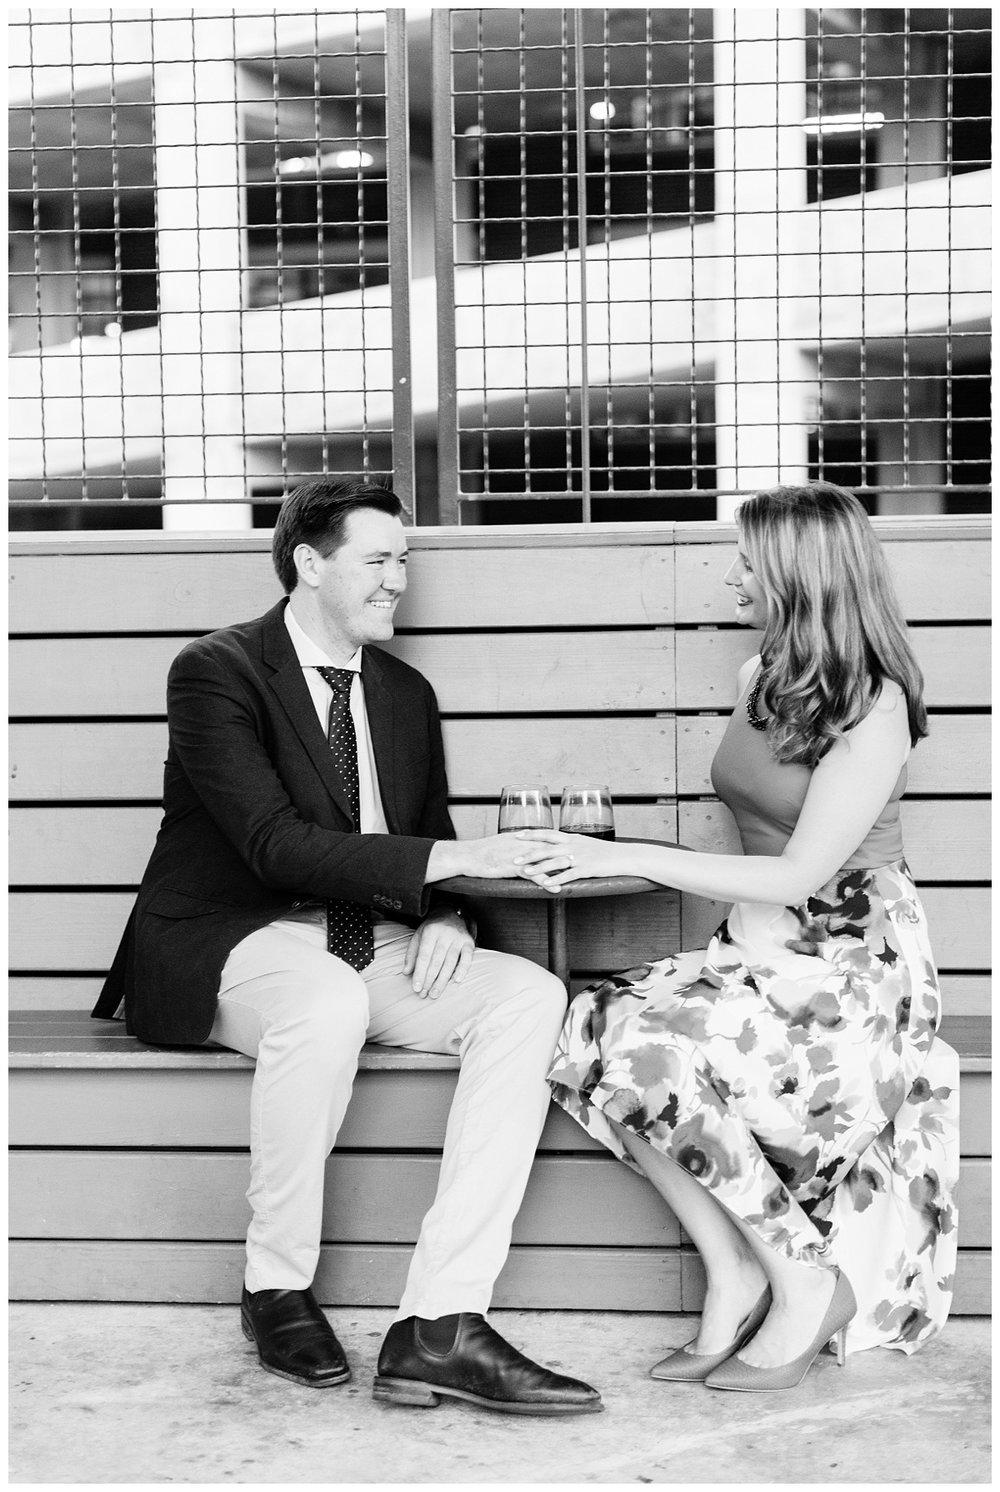 Engagement Pictures_KIm and Hamish_Abby Breaux Photography_Atlanta_Ponce City Market_Jackson Street Bridge_0056.jpg